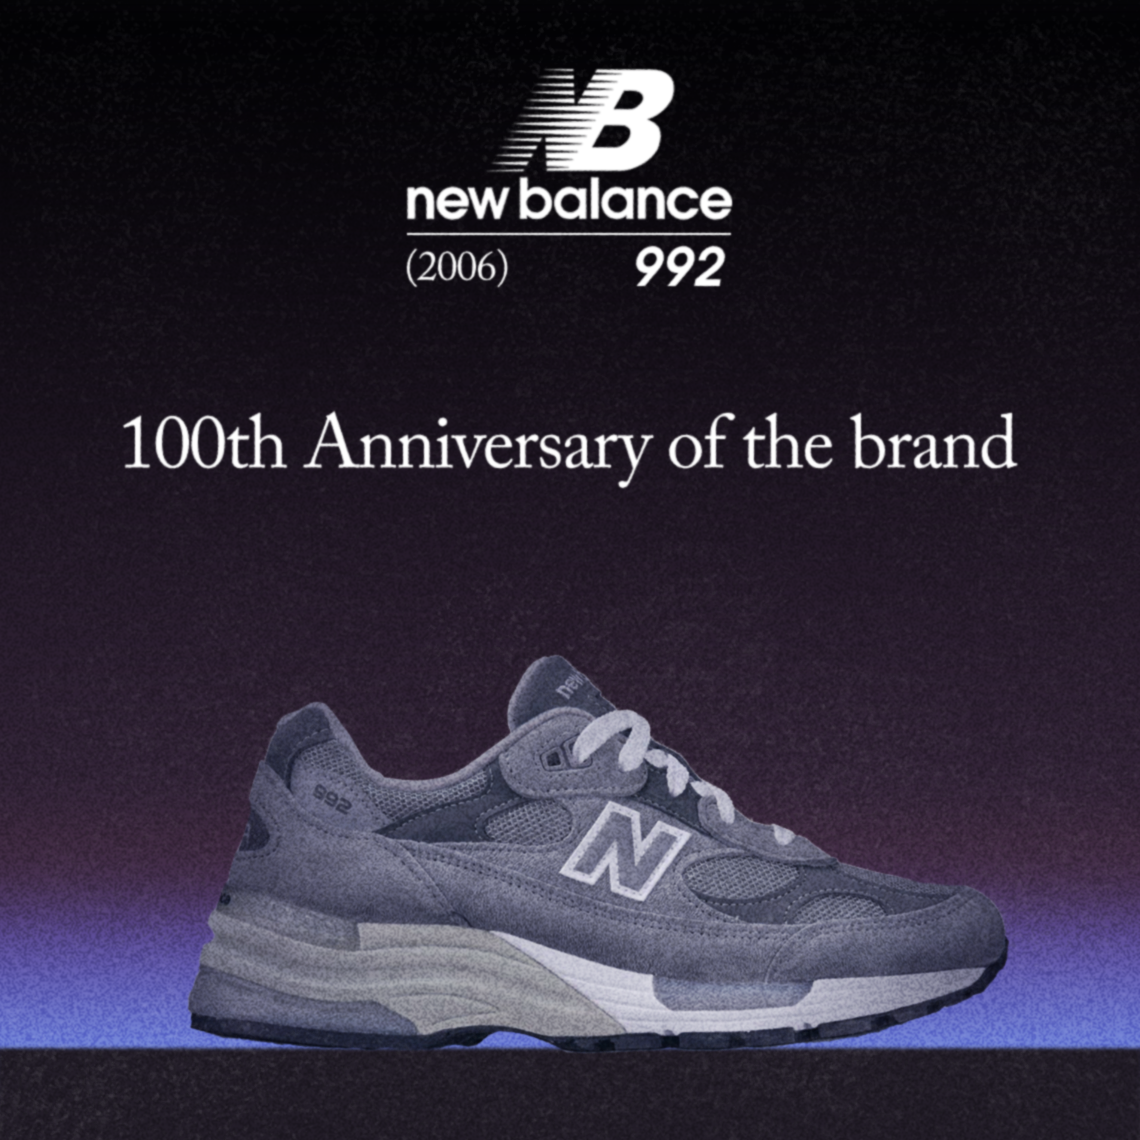 best price new balance 992 running 4f590 5ccf0